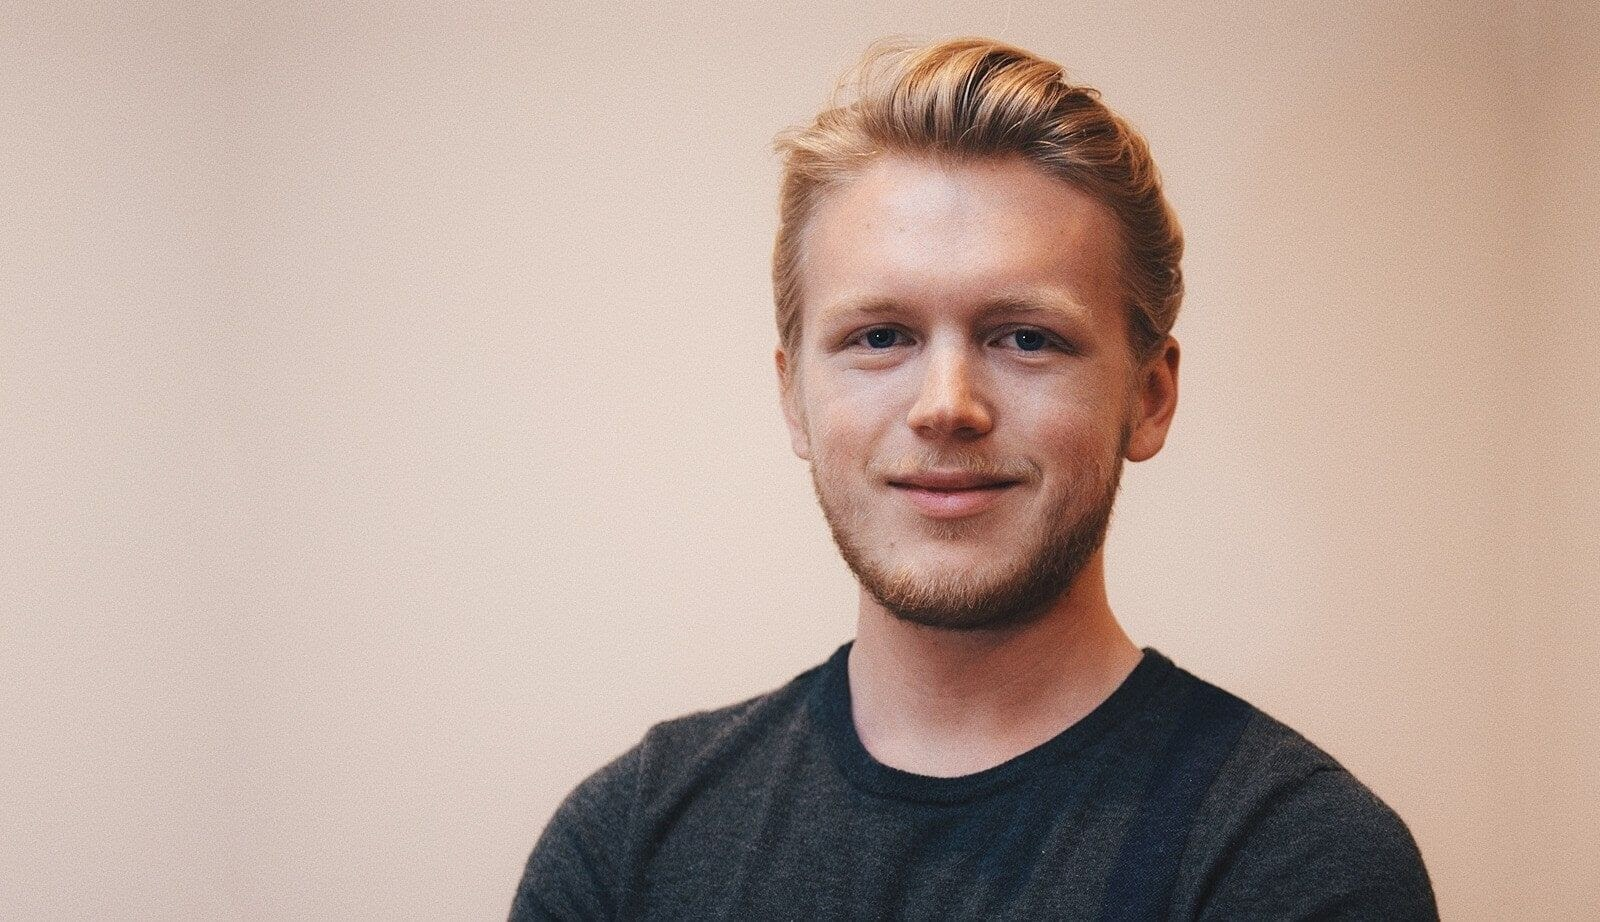 Entrepreneur blogs #21: Nat Eliason's Blog